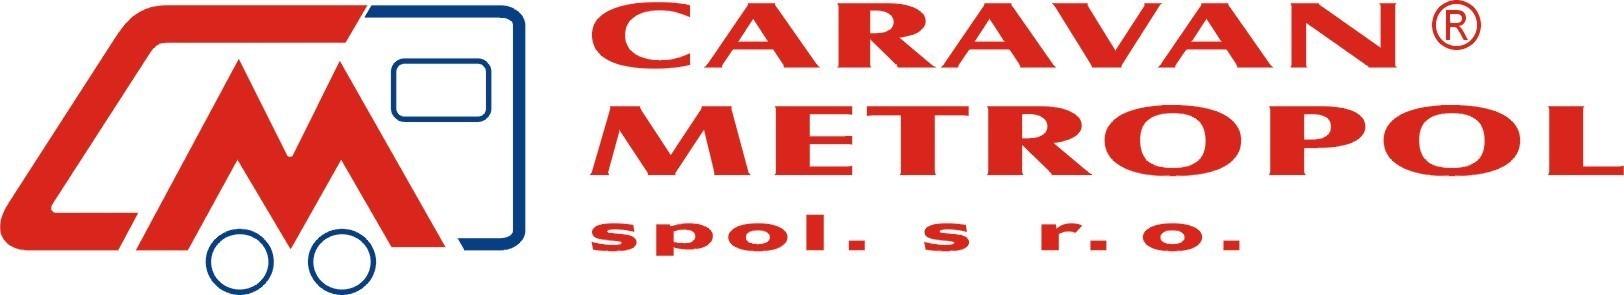 Caravan Metropol, s.r.o.